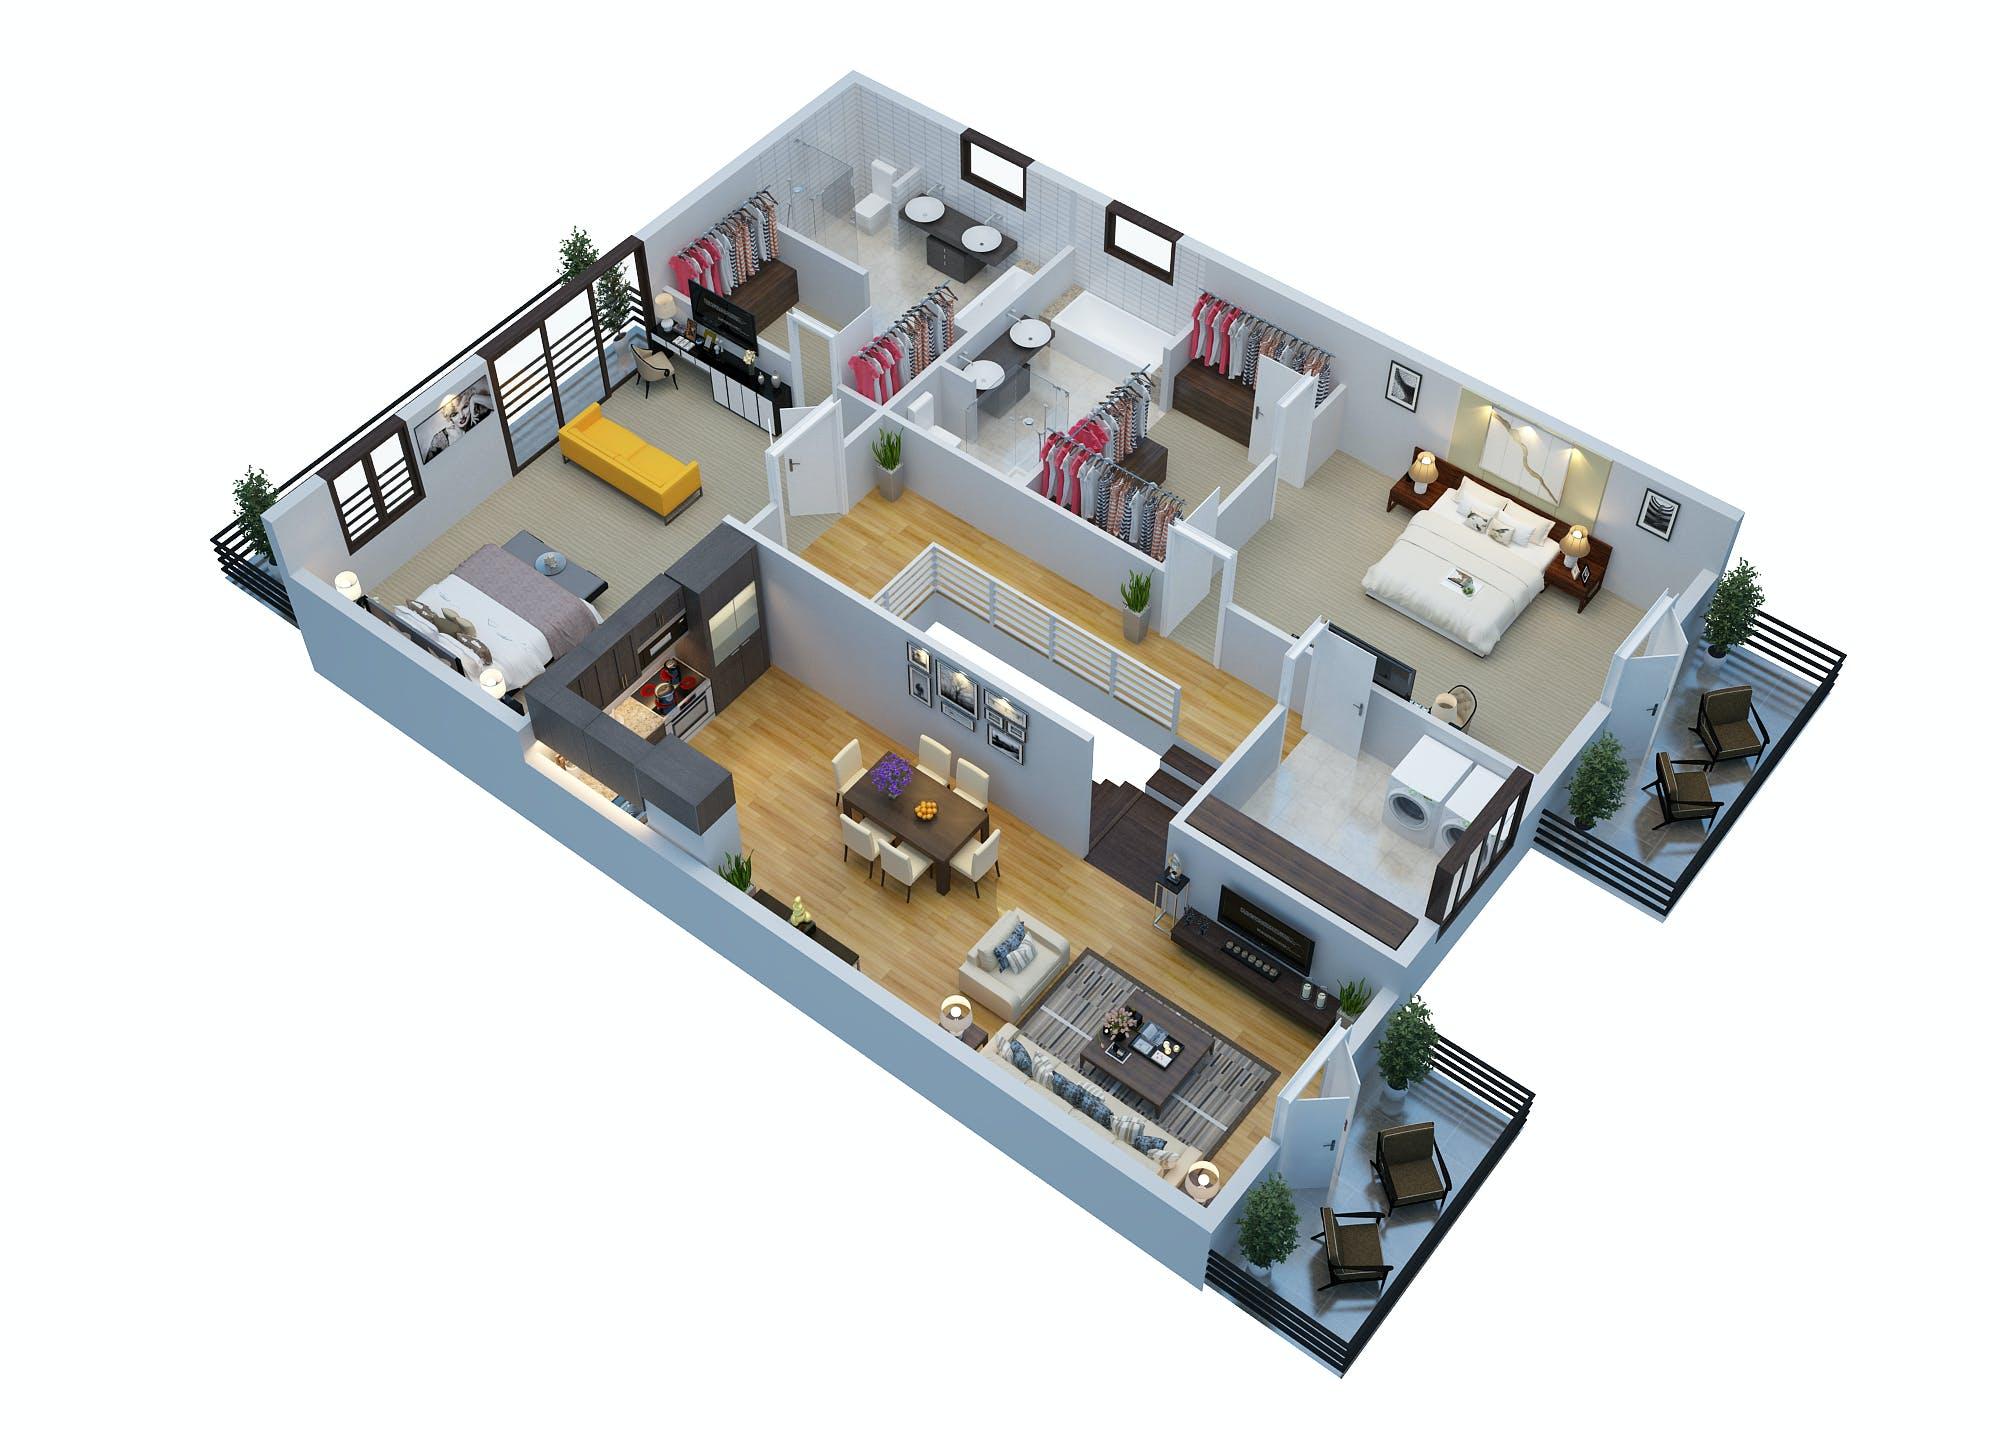 Architectural 3d floor plan rendering services 3d for 3d floor plan rendering